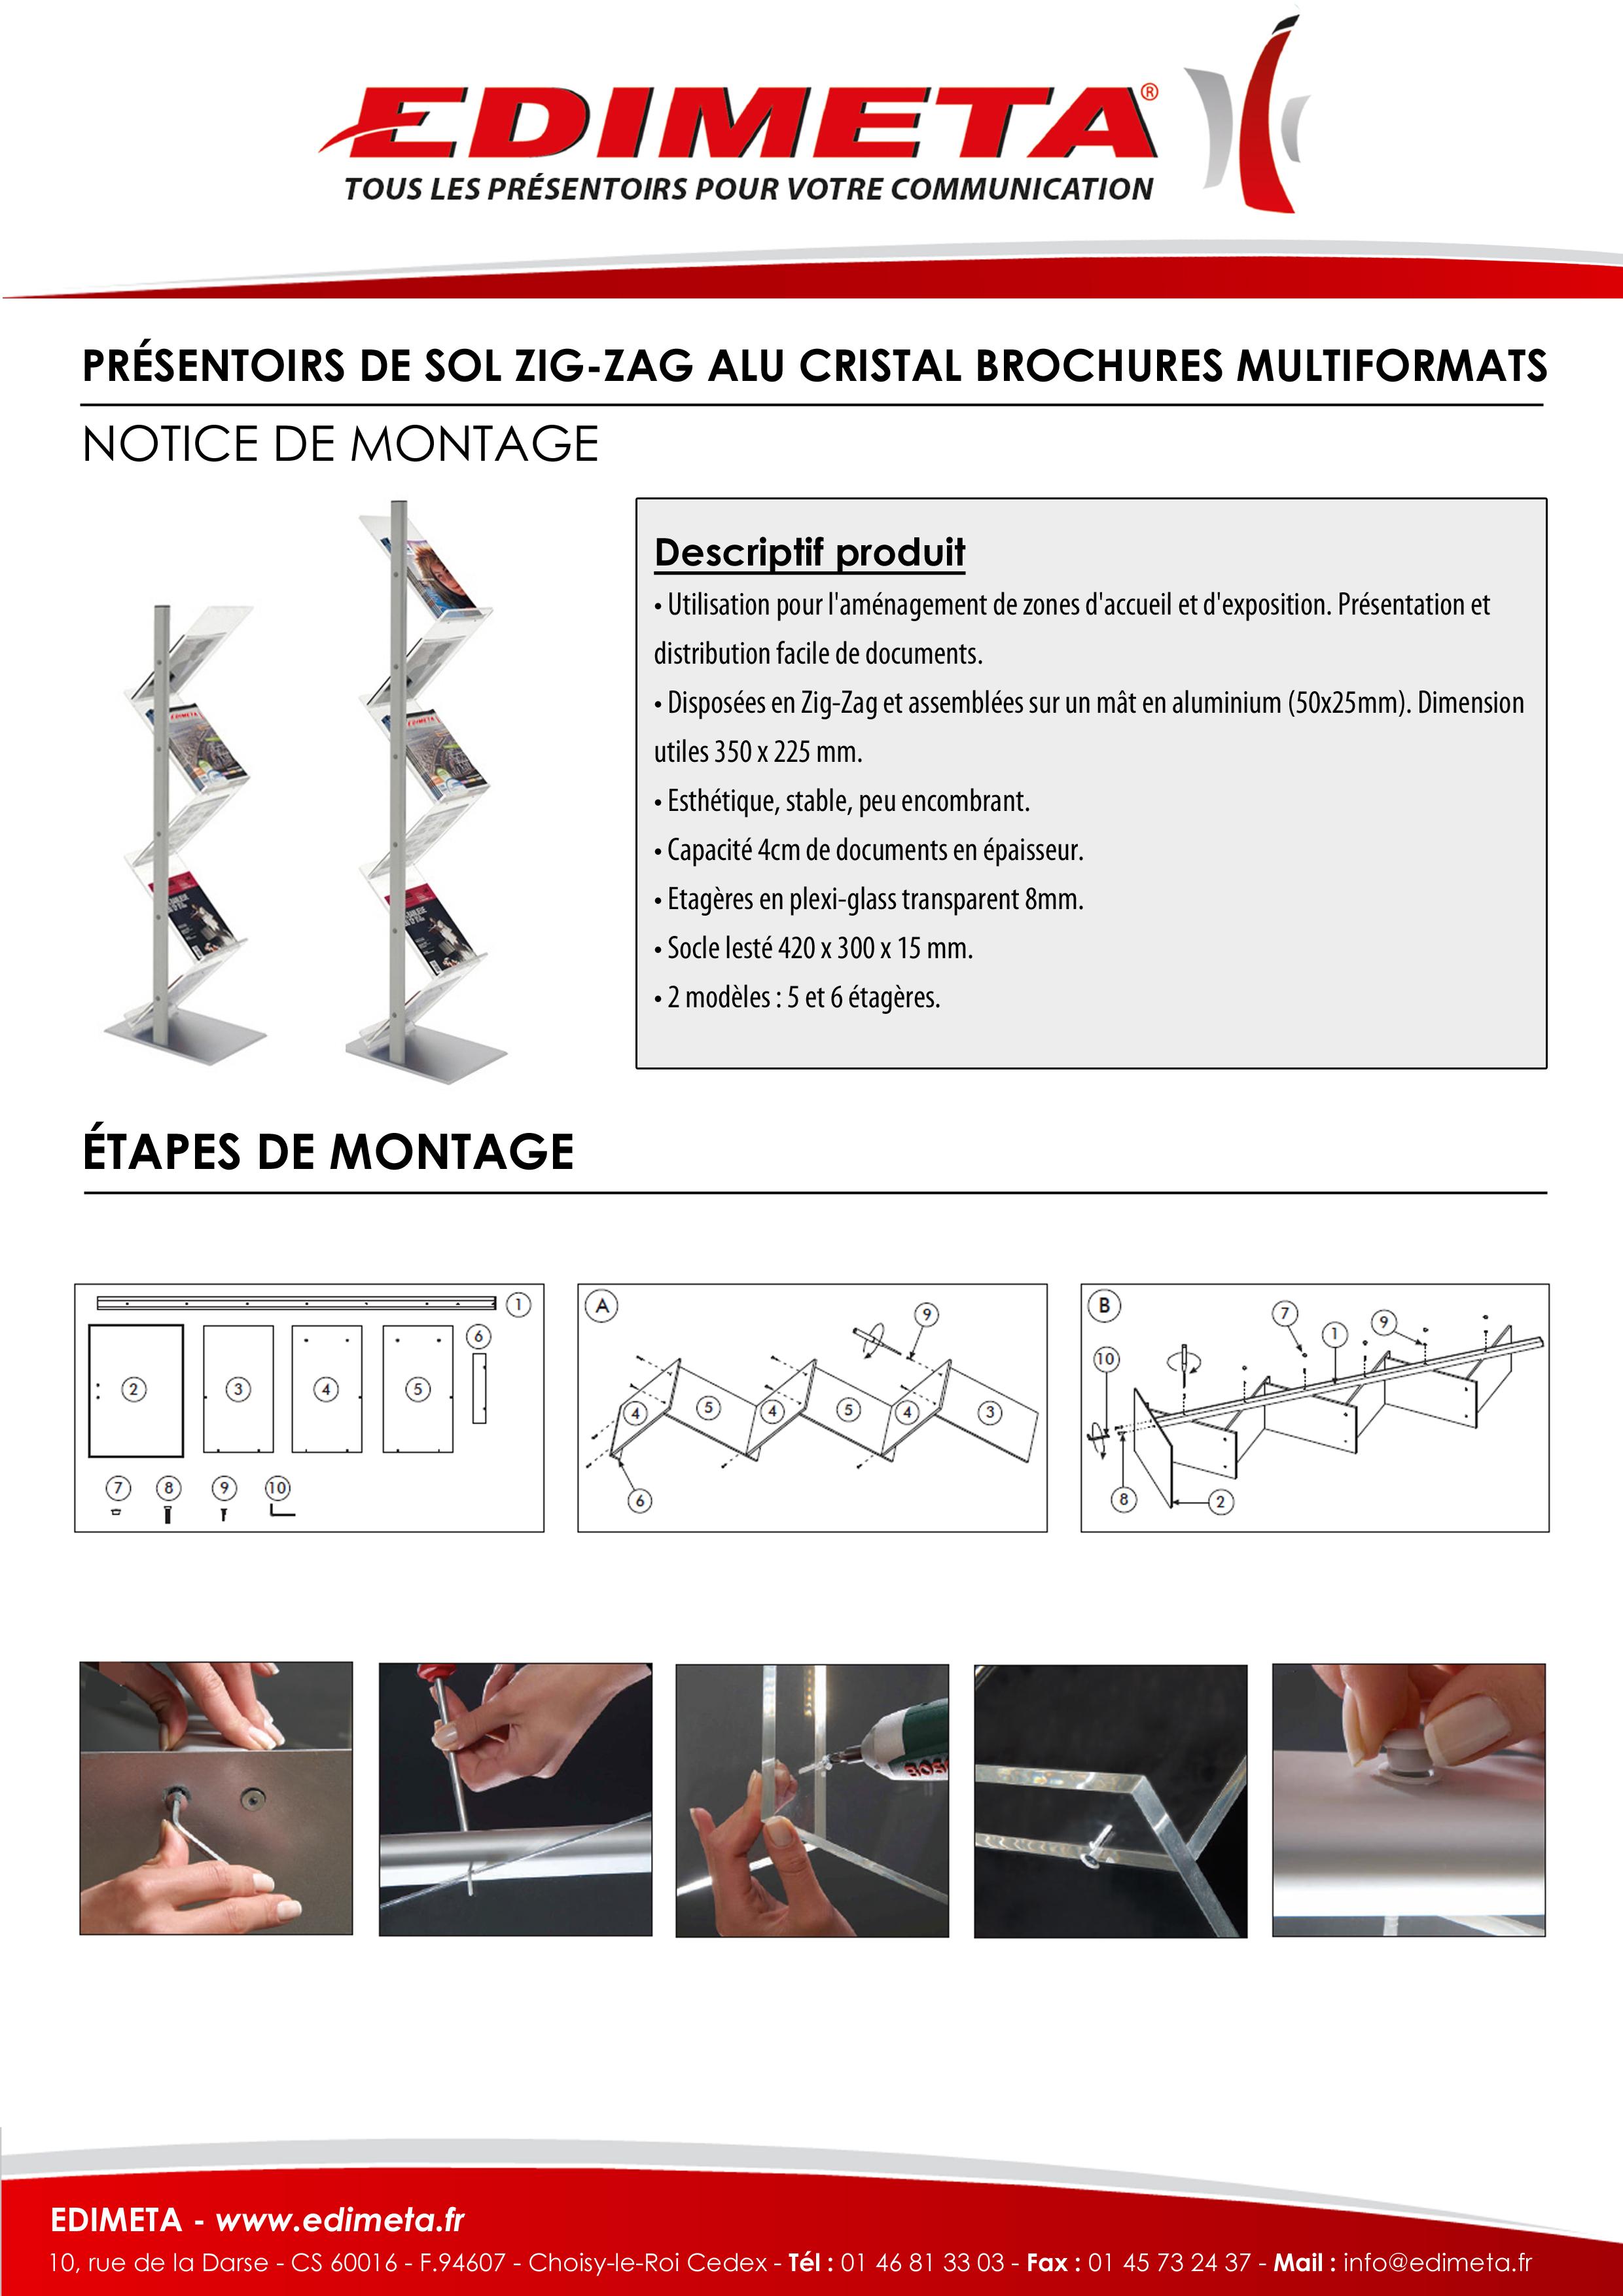 NOTICE DE MONTAGE : PRÉSENTOIRS DE SOL ZIG-ZAG ALU CRISTAL BROCHURES MULTIFORMATS